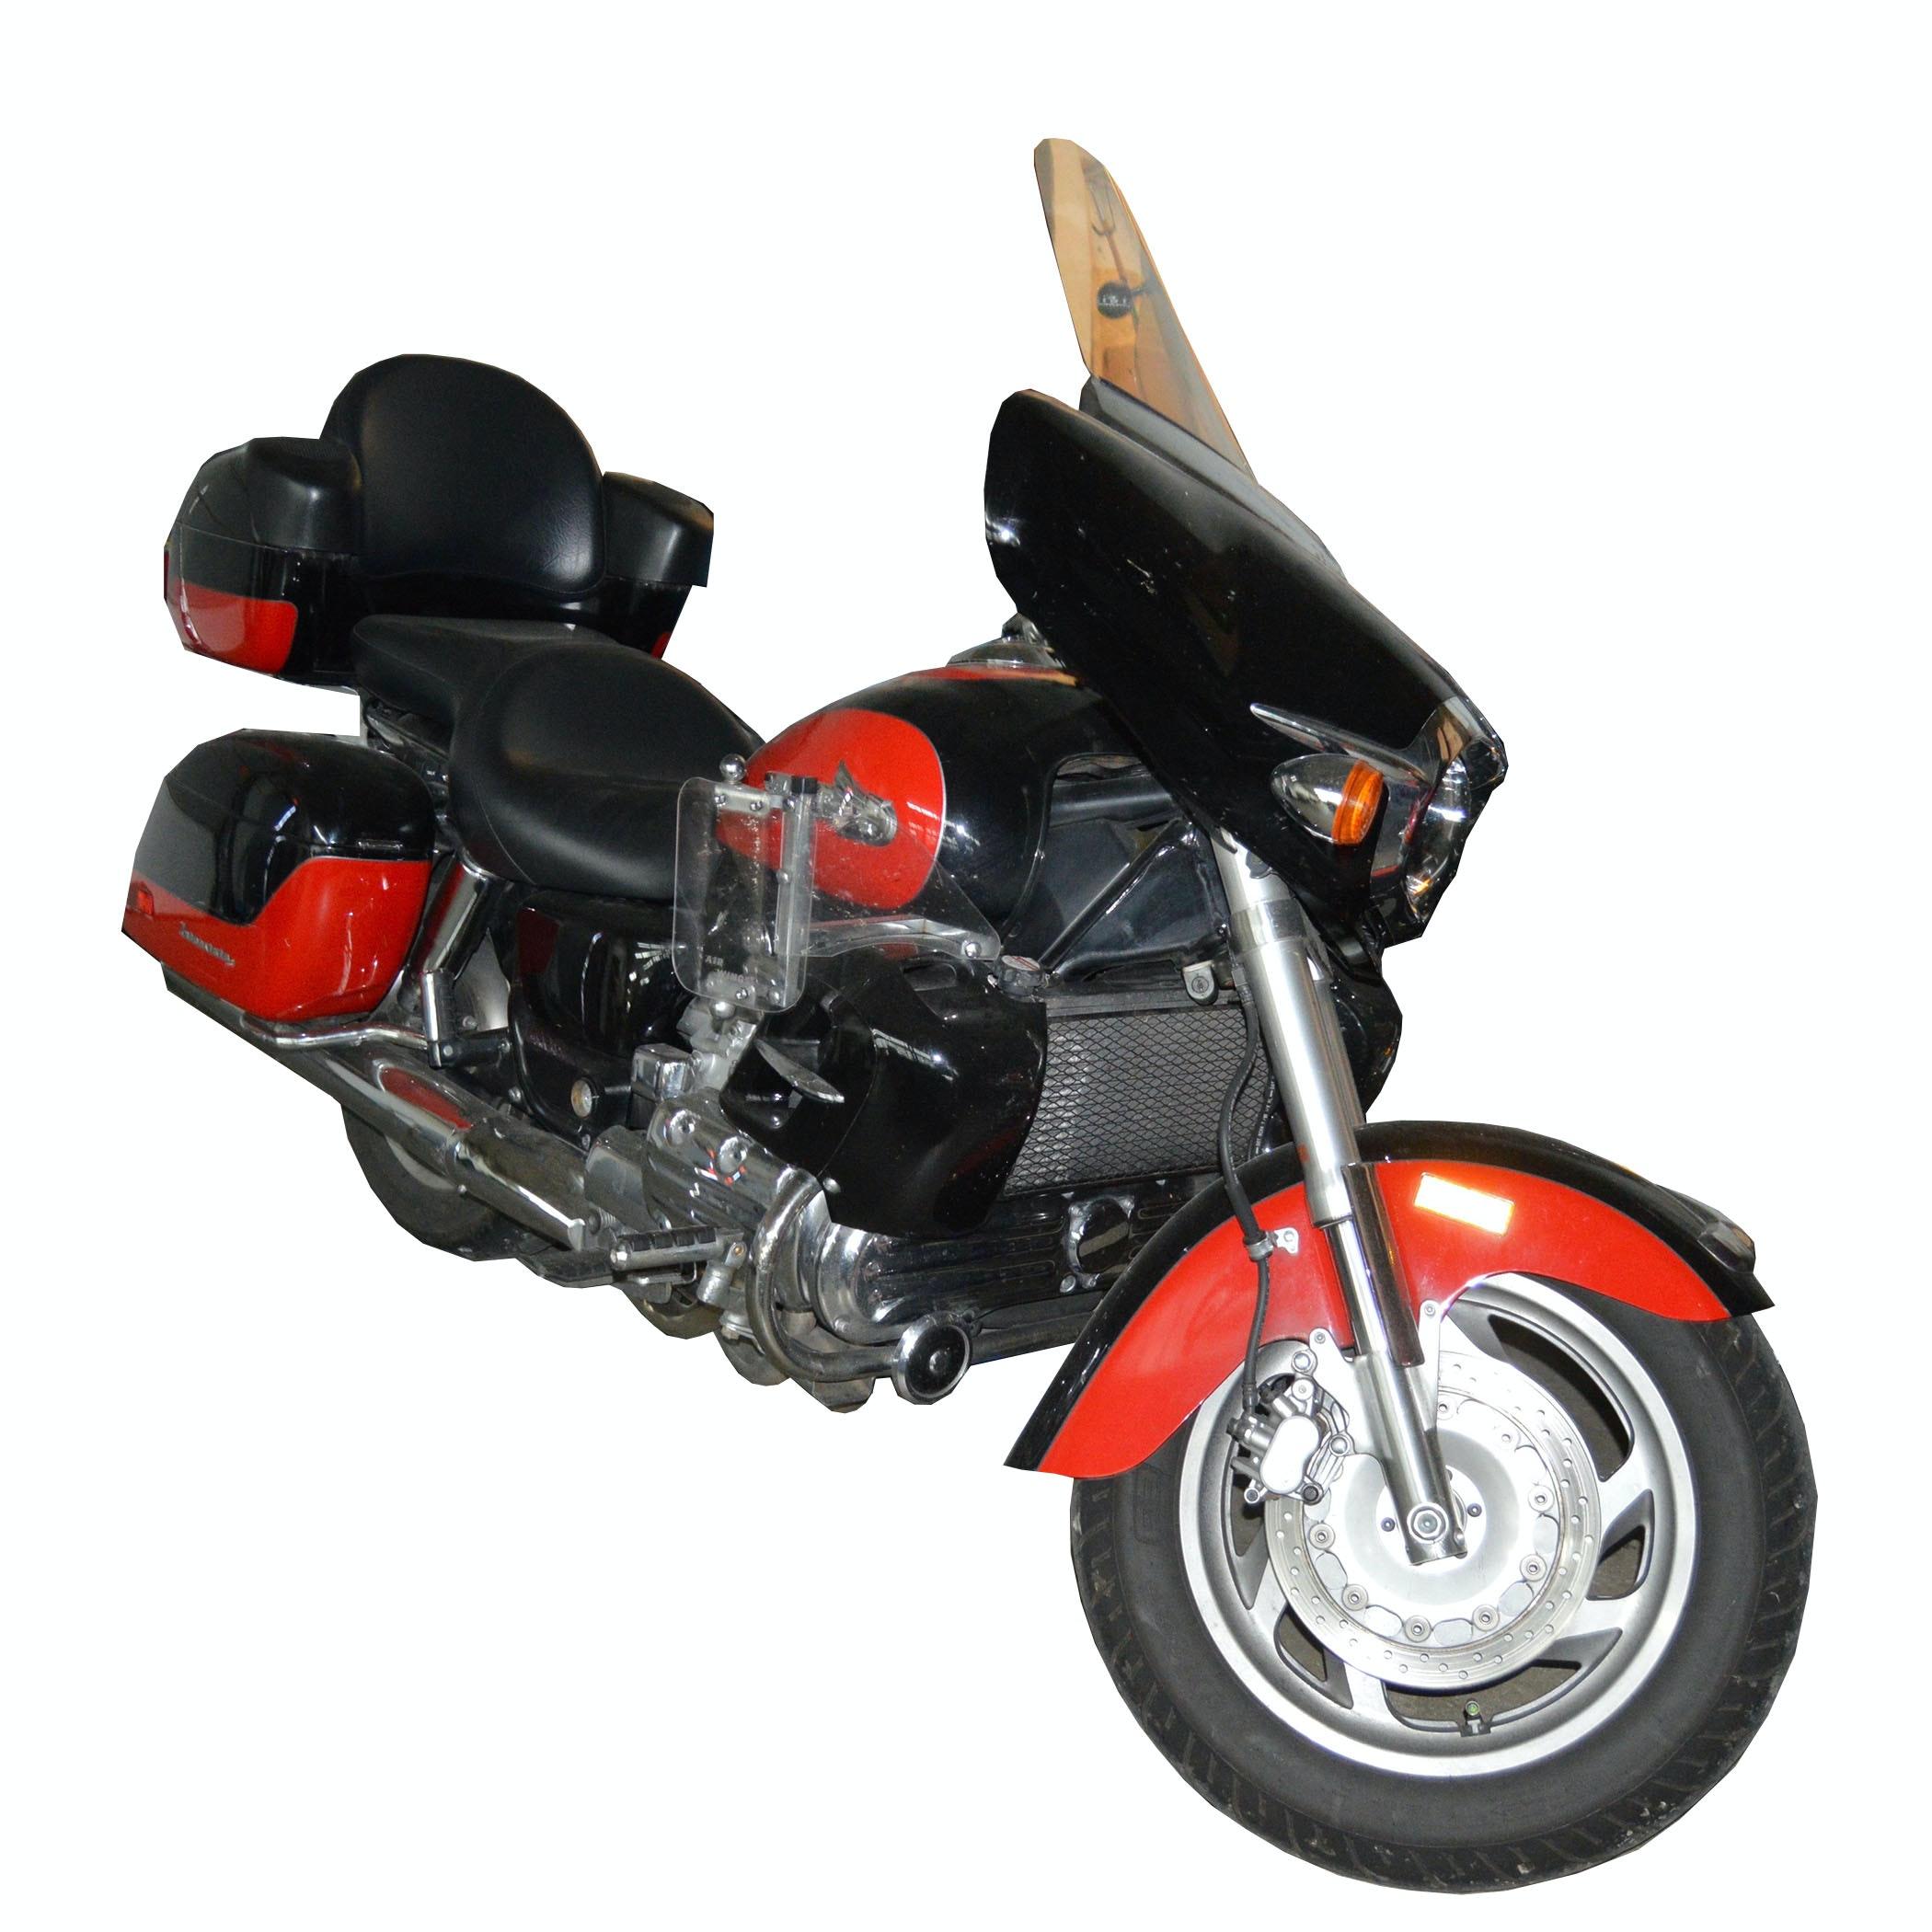 1999 Honda Valkyrie Interstate Motorcycle